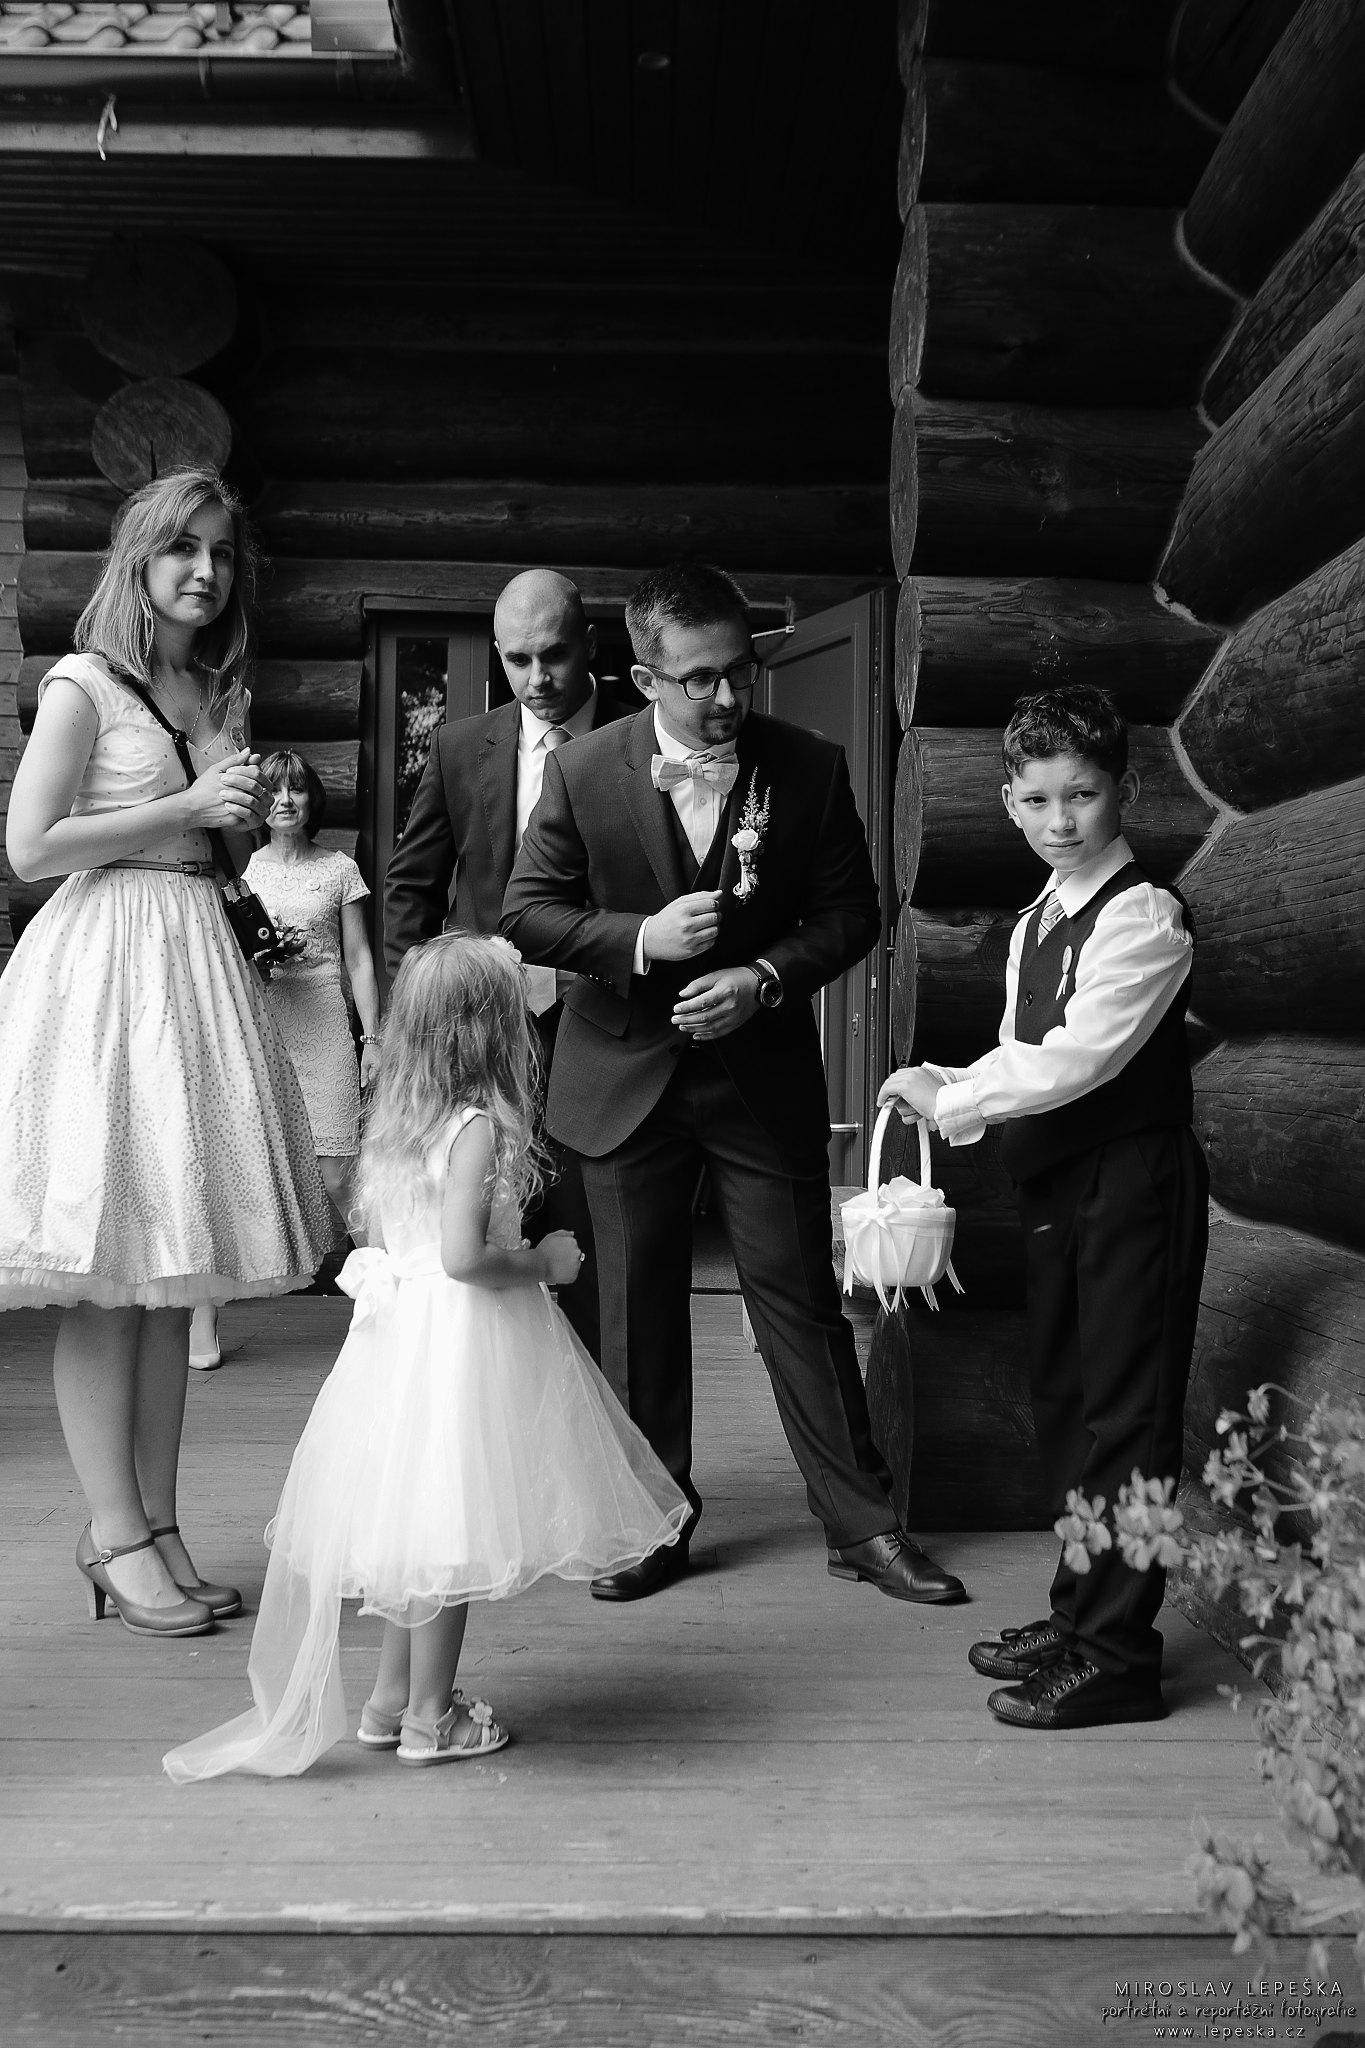 svatebni fotografie